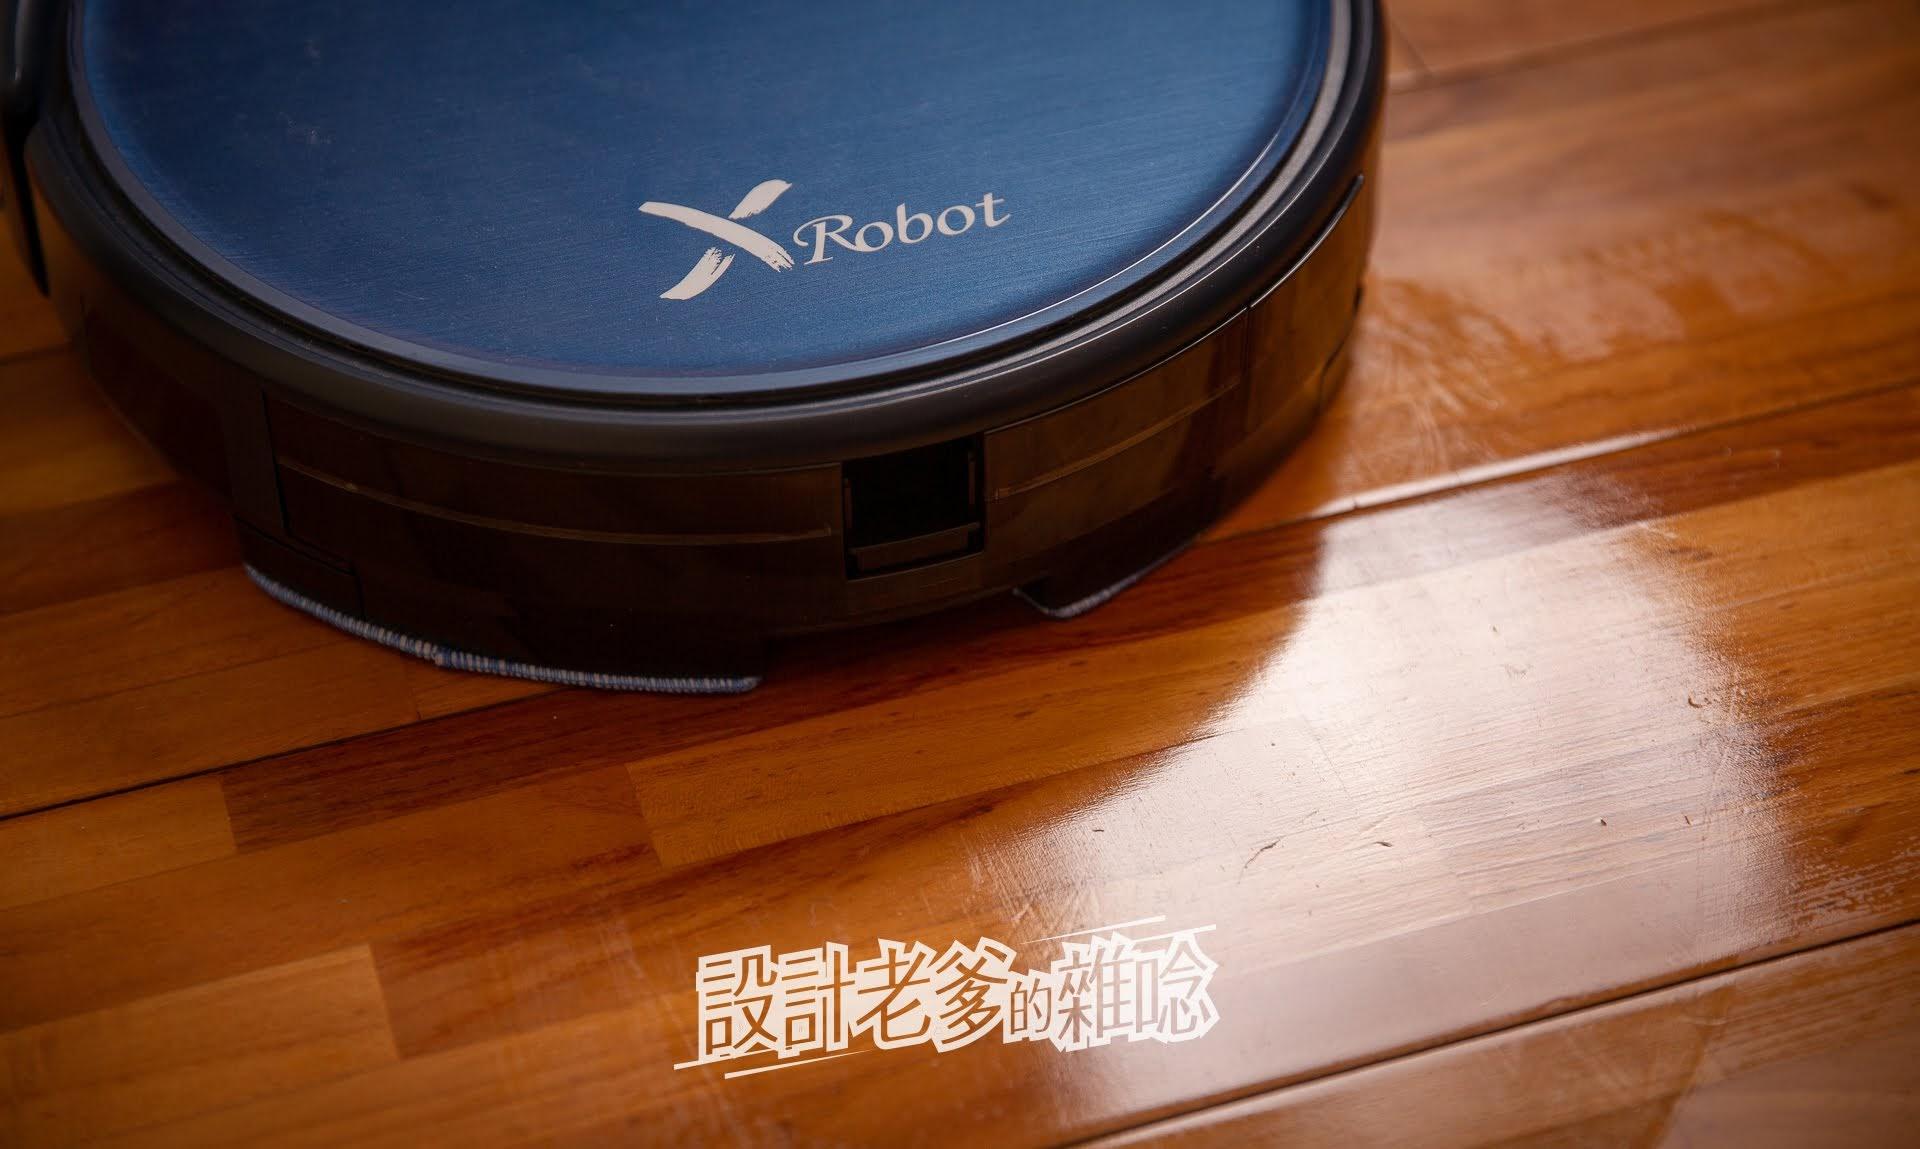 TiDdi 陀螺儀導航機器人(Xrobot系列) V560...我的家庭打掃小管家真的越來越厲害了!